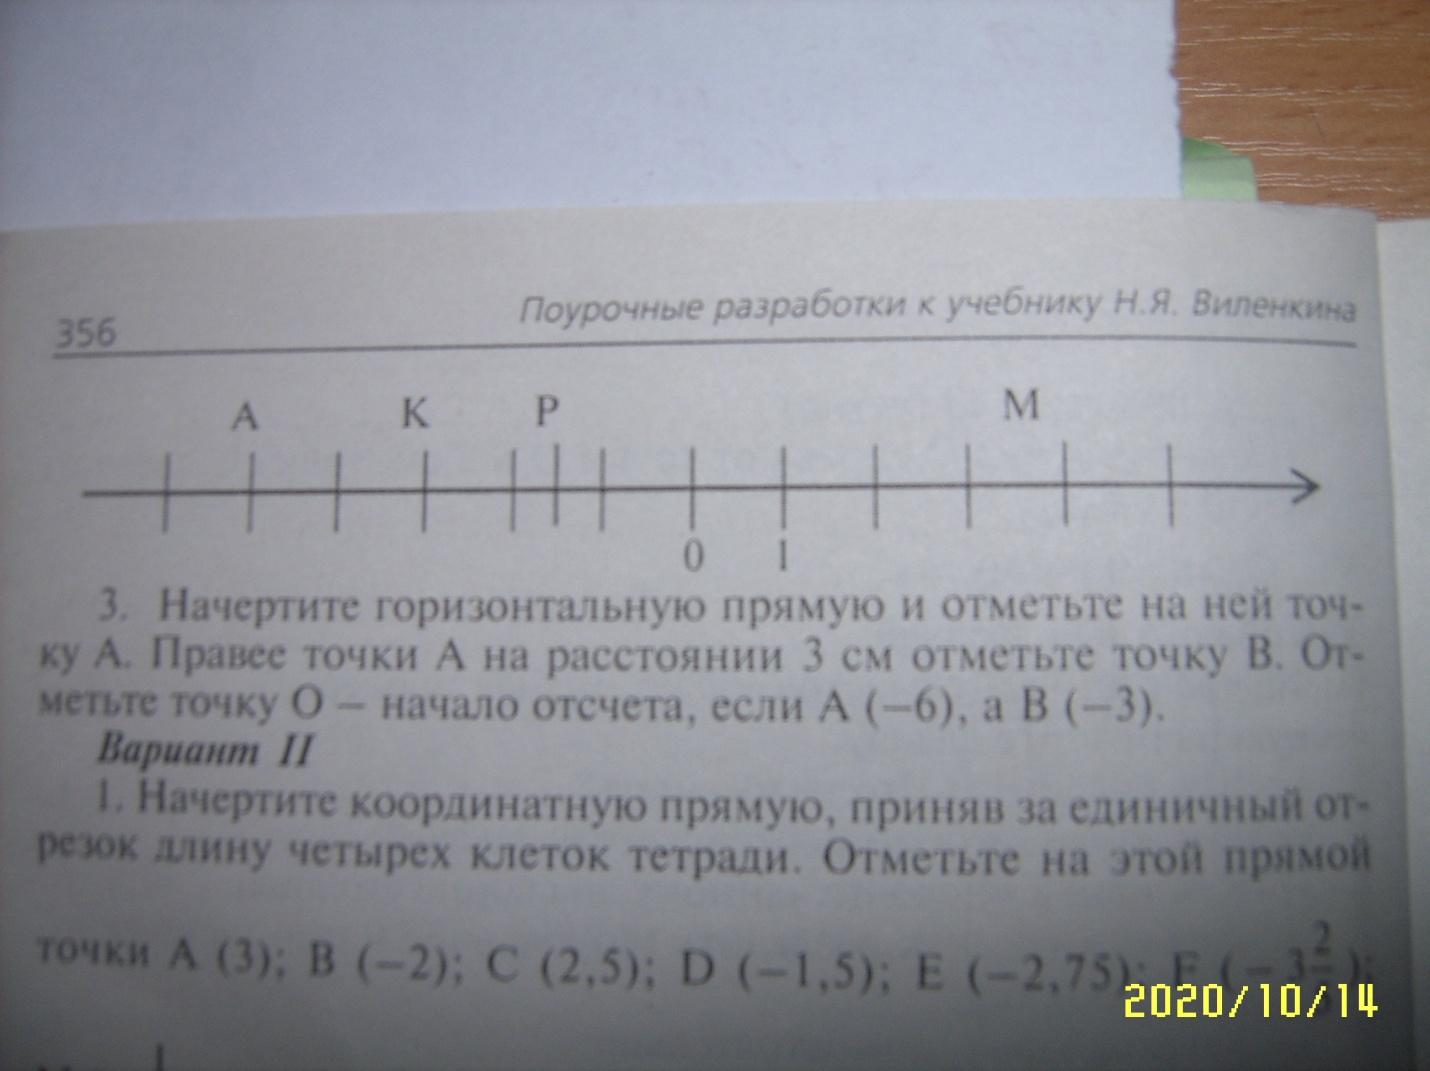 G:\DCIM\101SSCAM\SUC50005.JPG